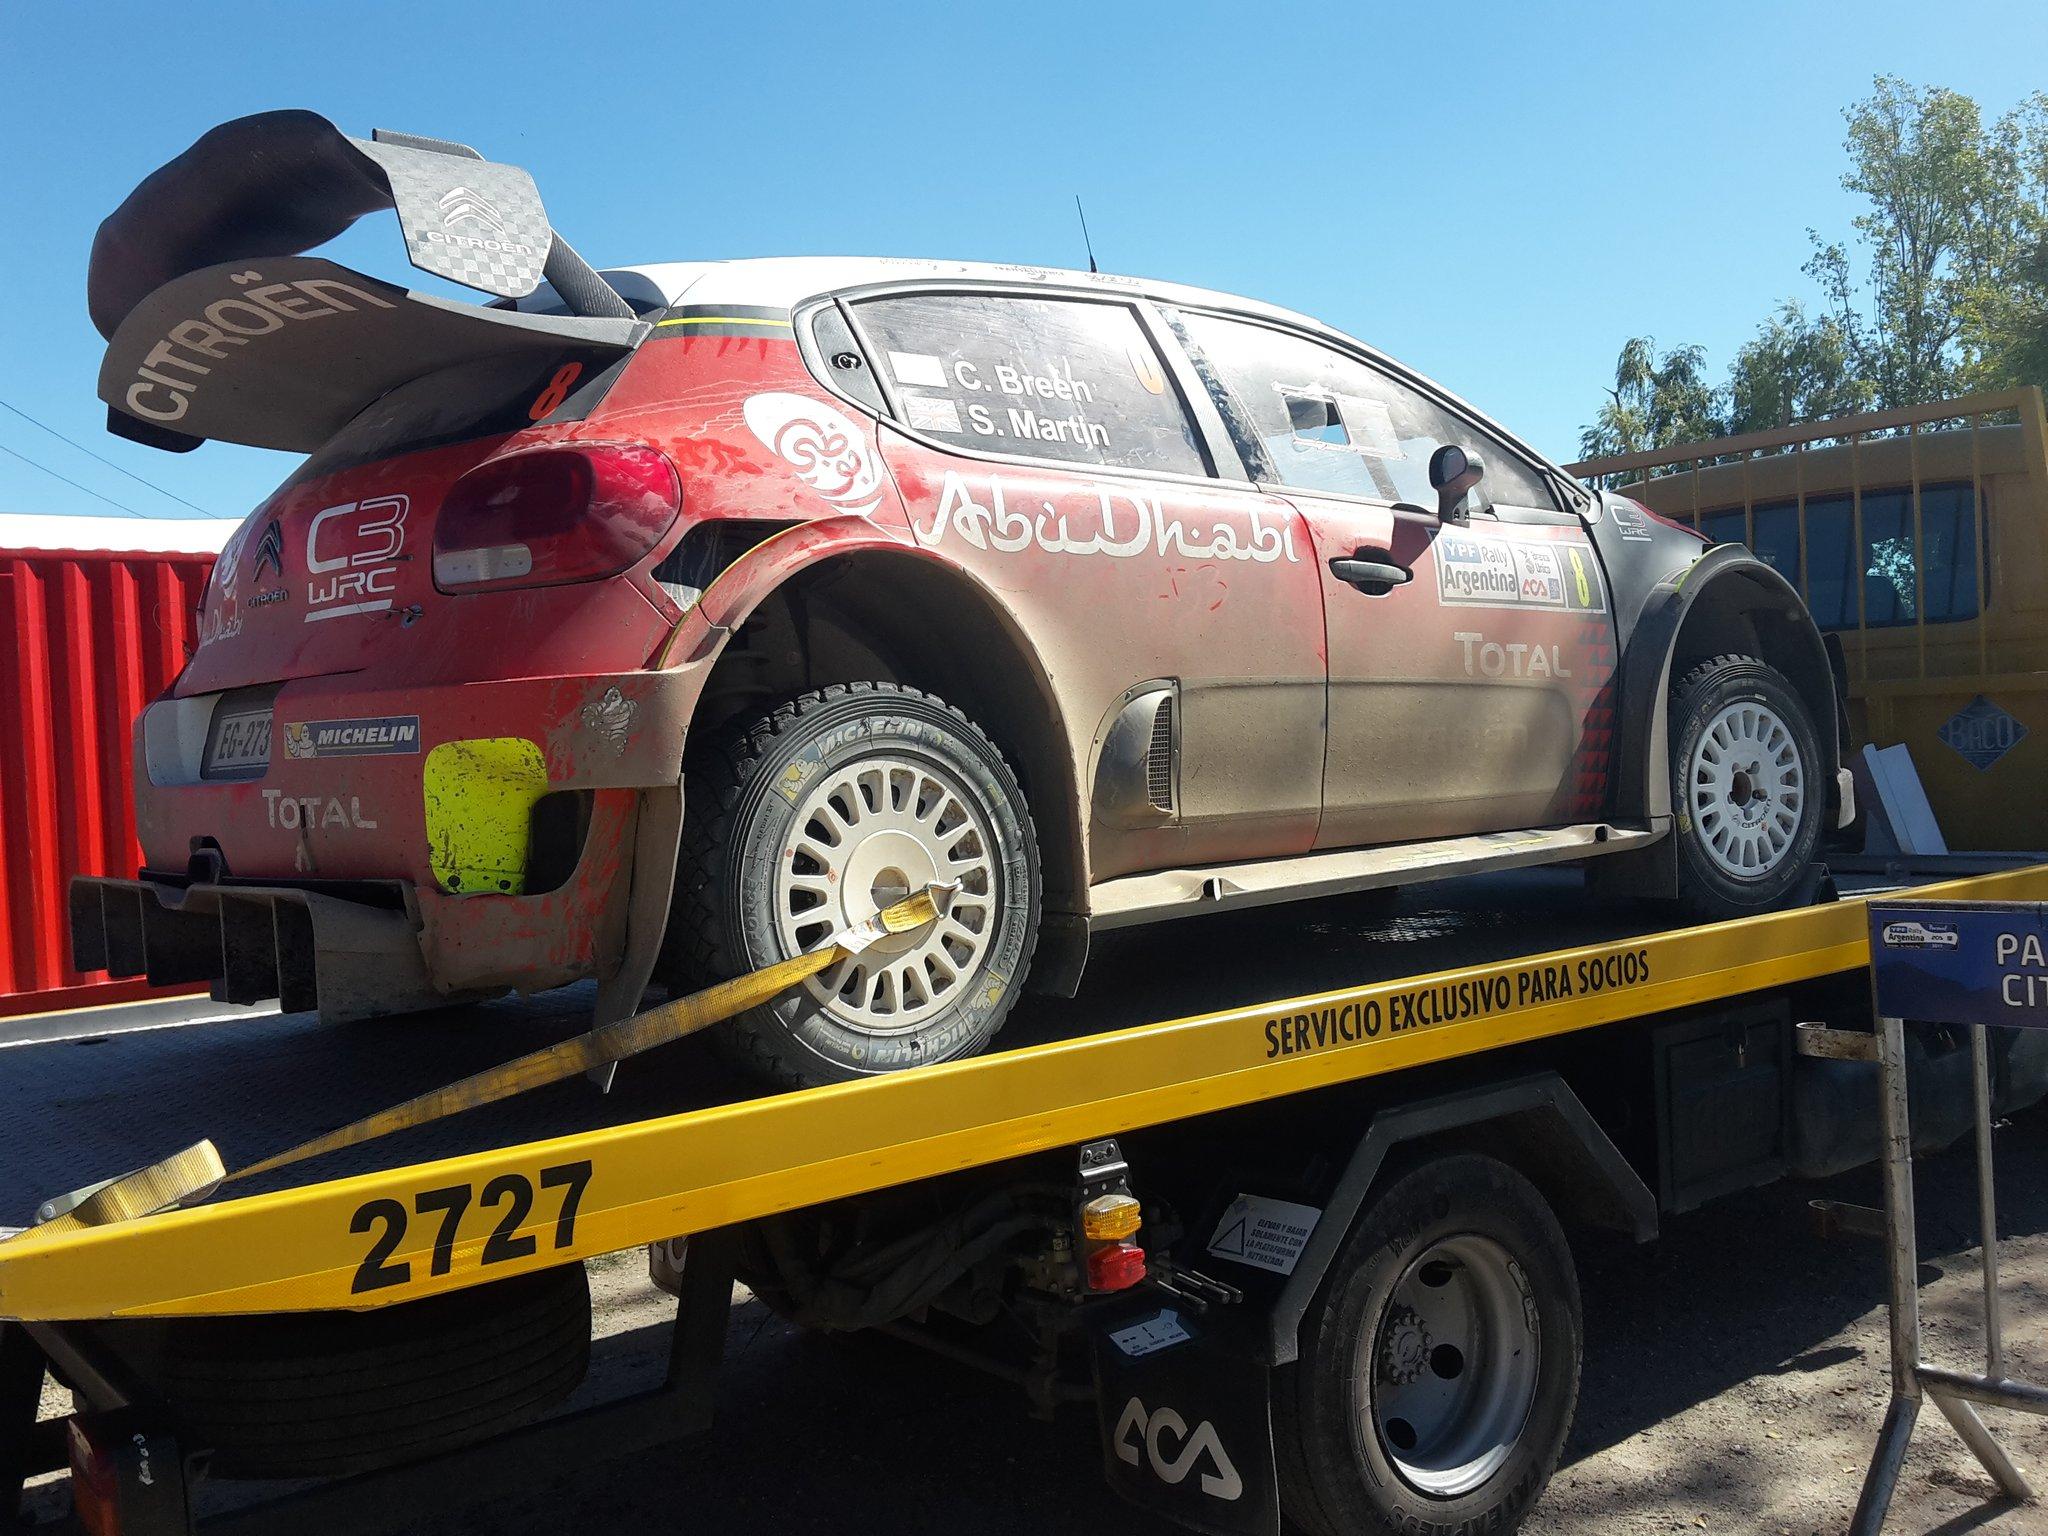 Rally Argentina 2017 - Página 2 C-g0mErXkAEkZ-c